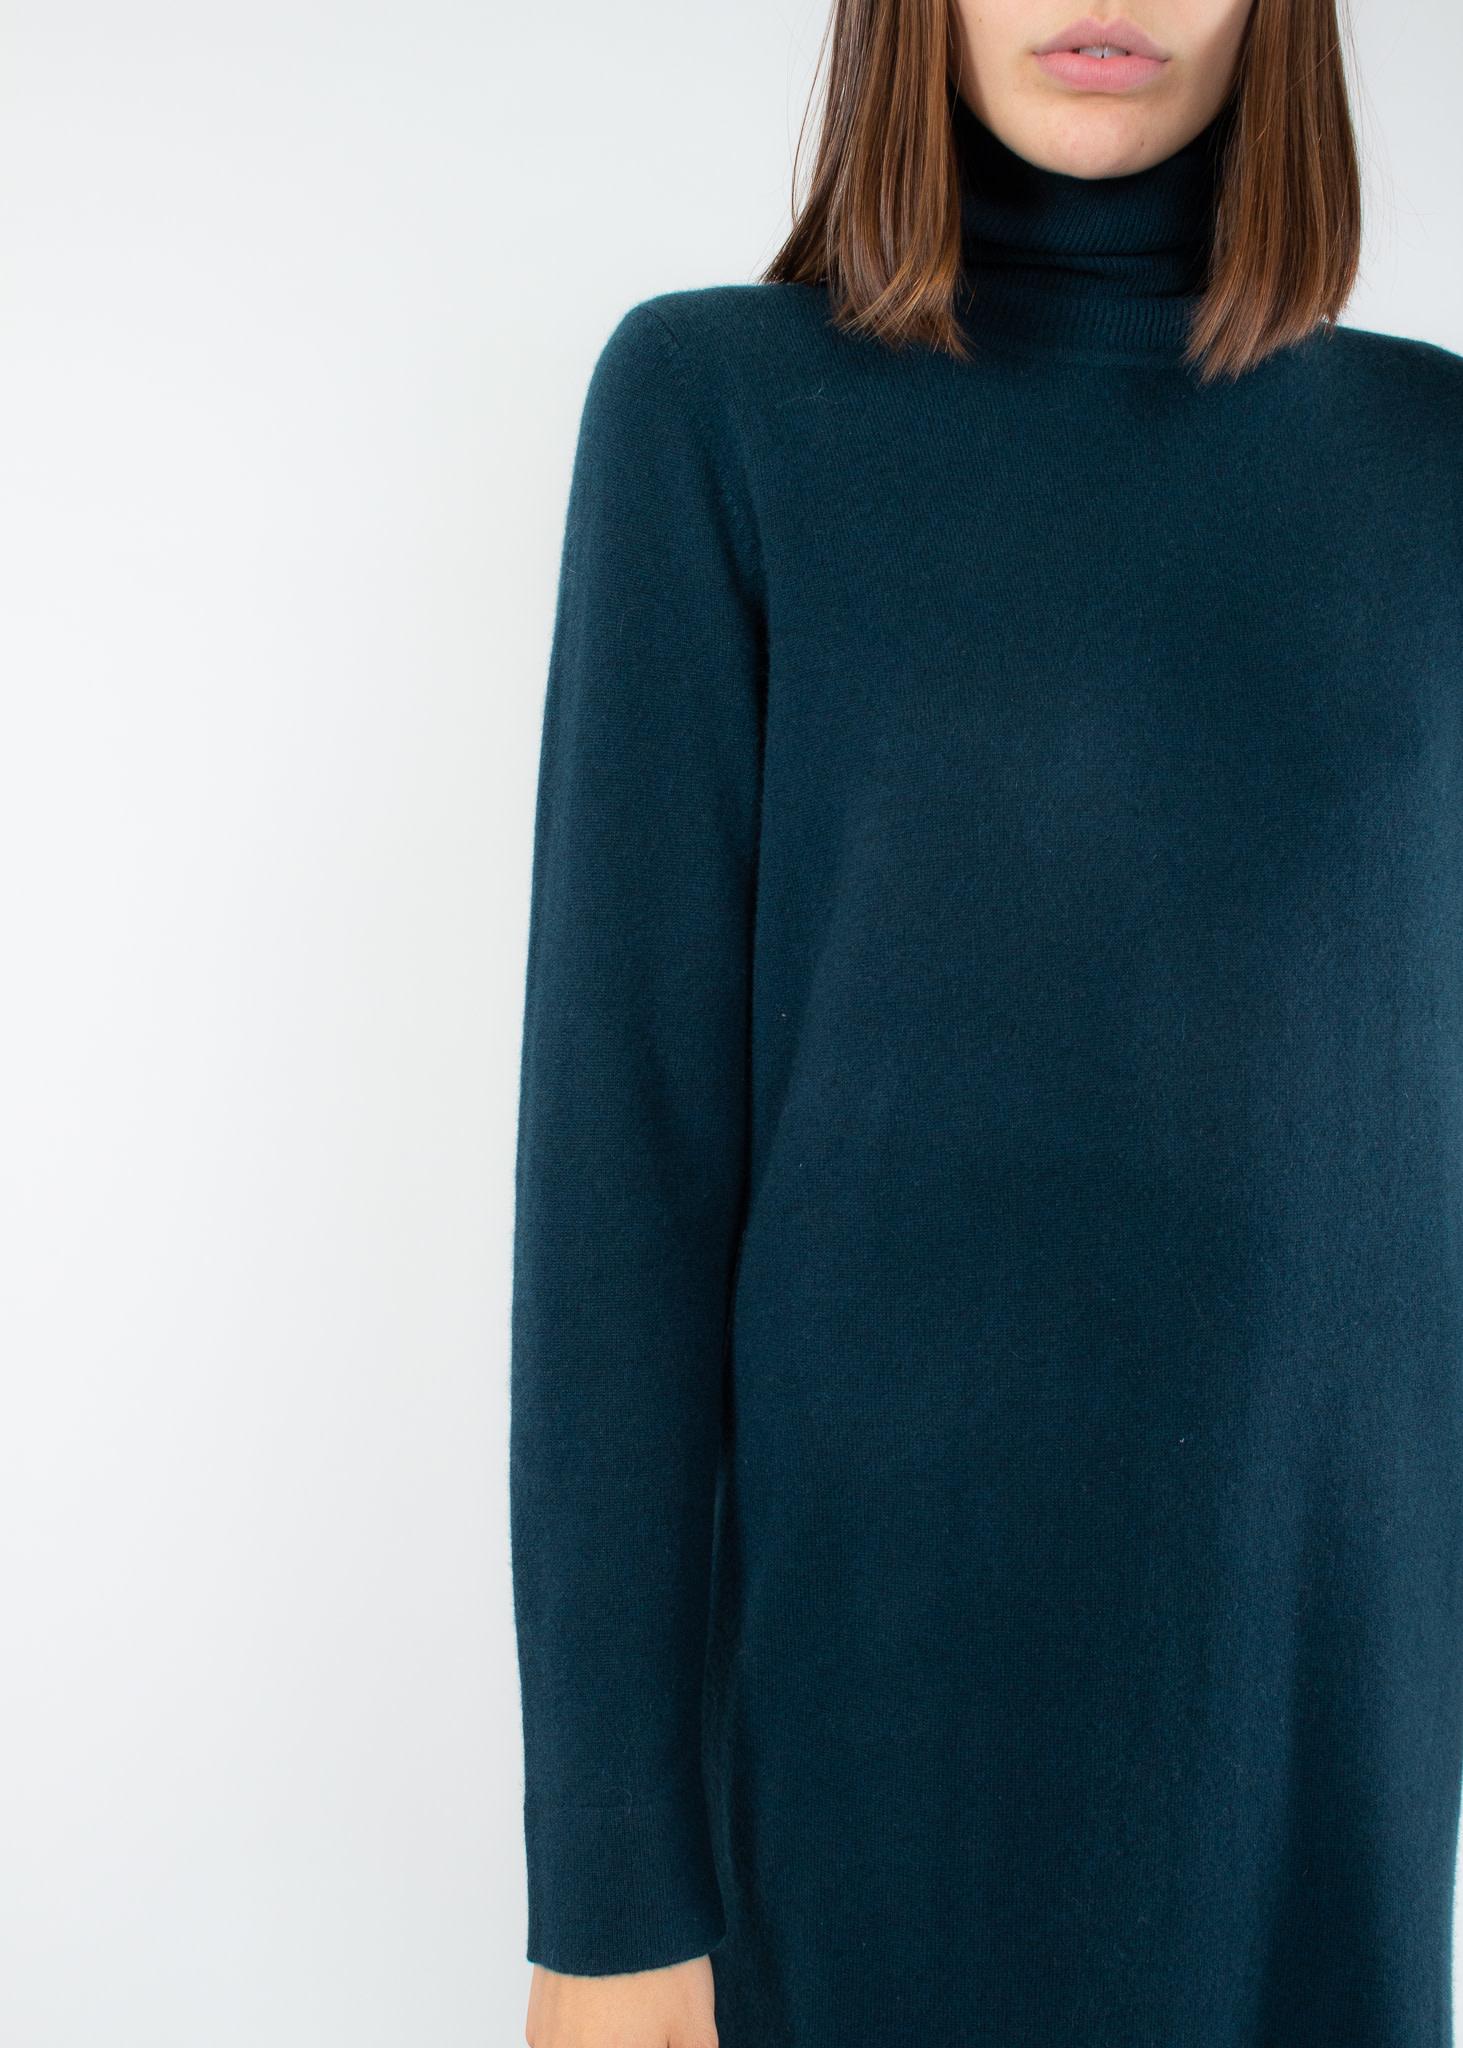 REPEAT 100355 - Robe cachemire